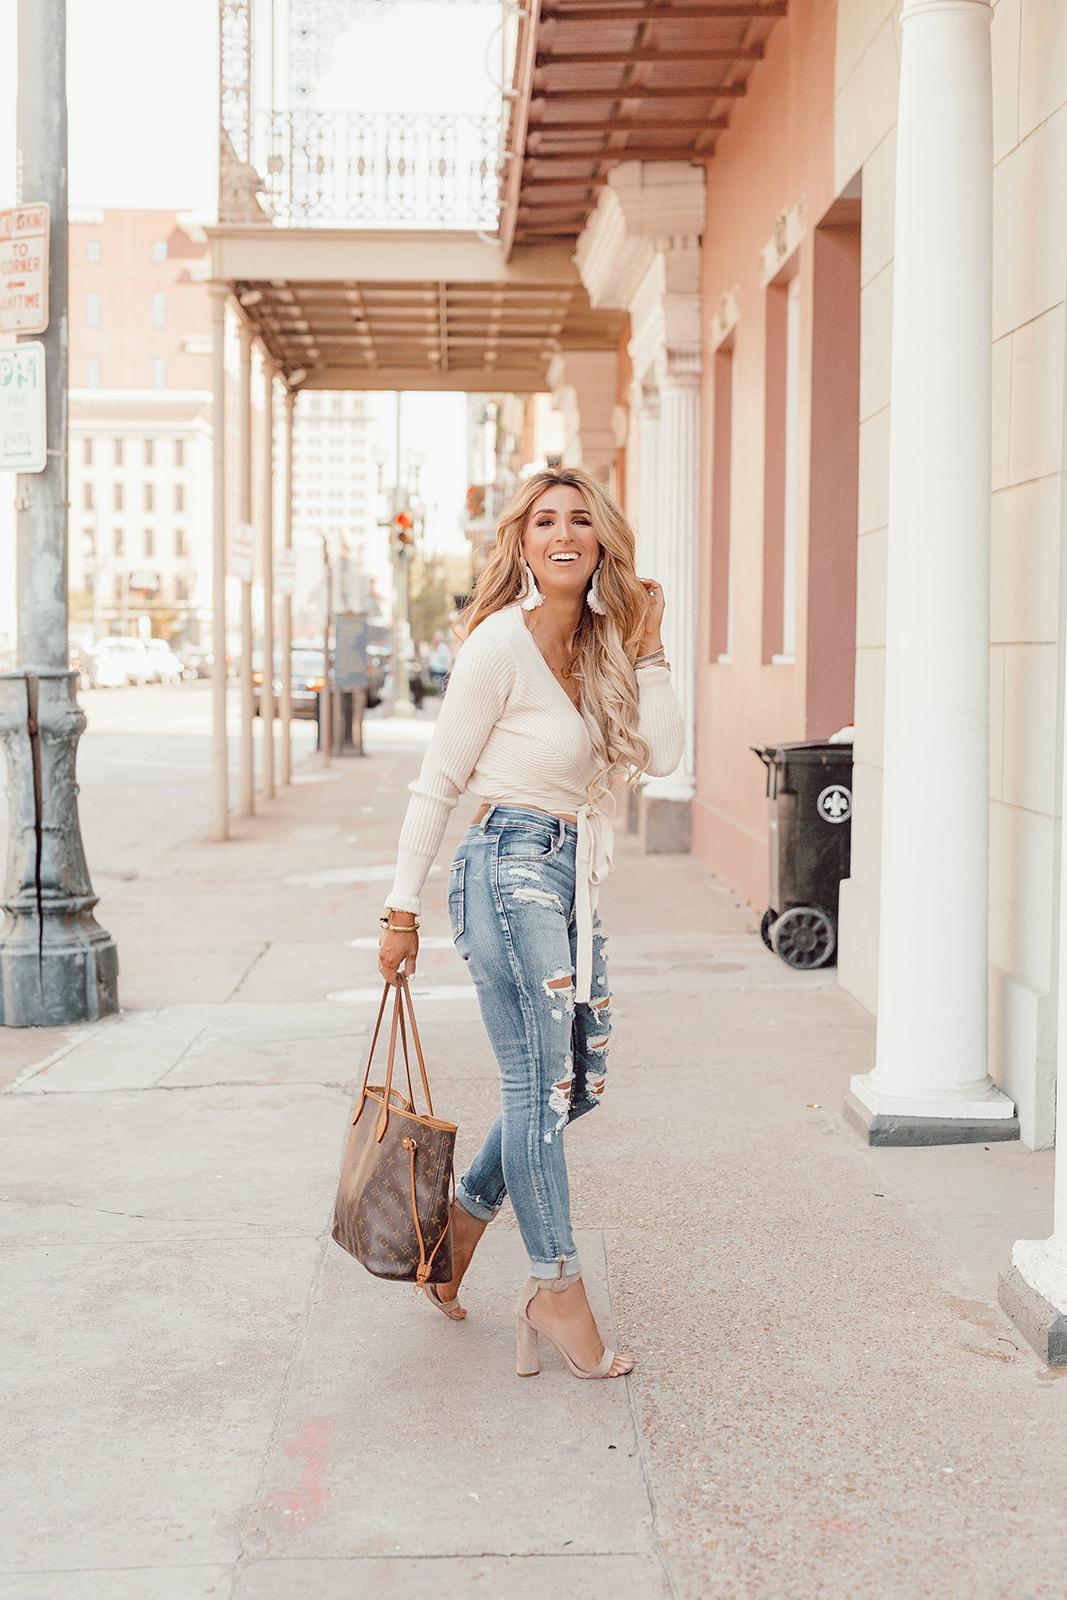 denim outfit ideas for women